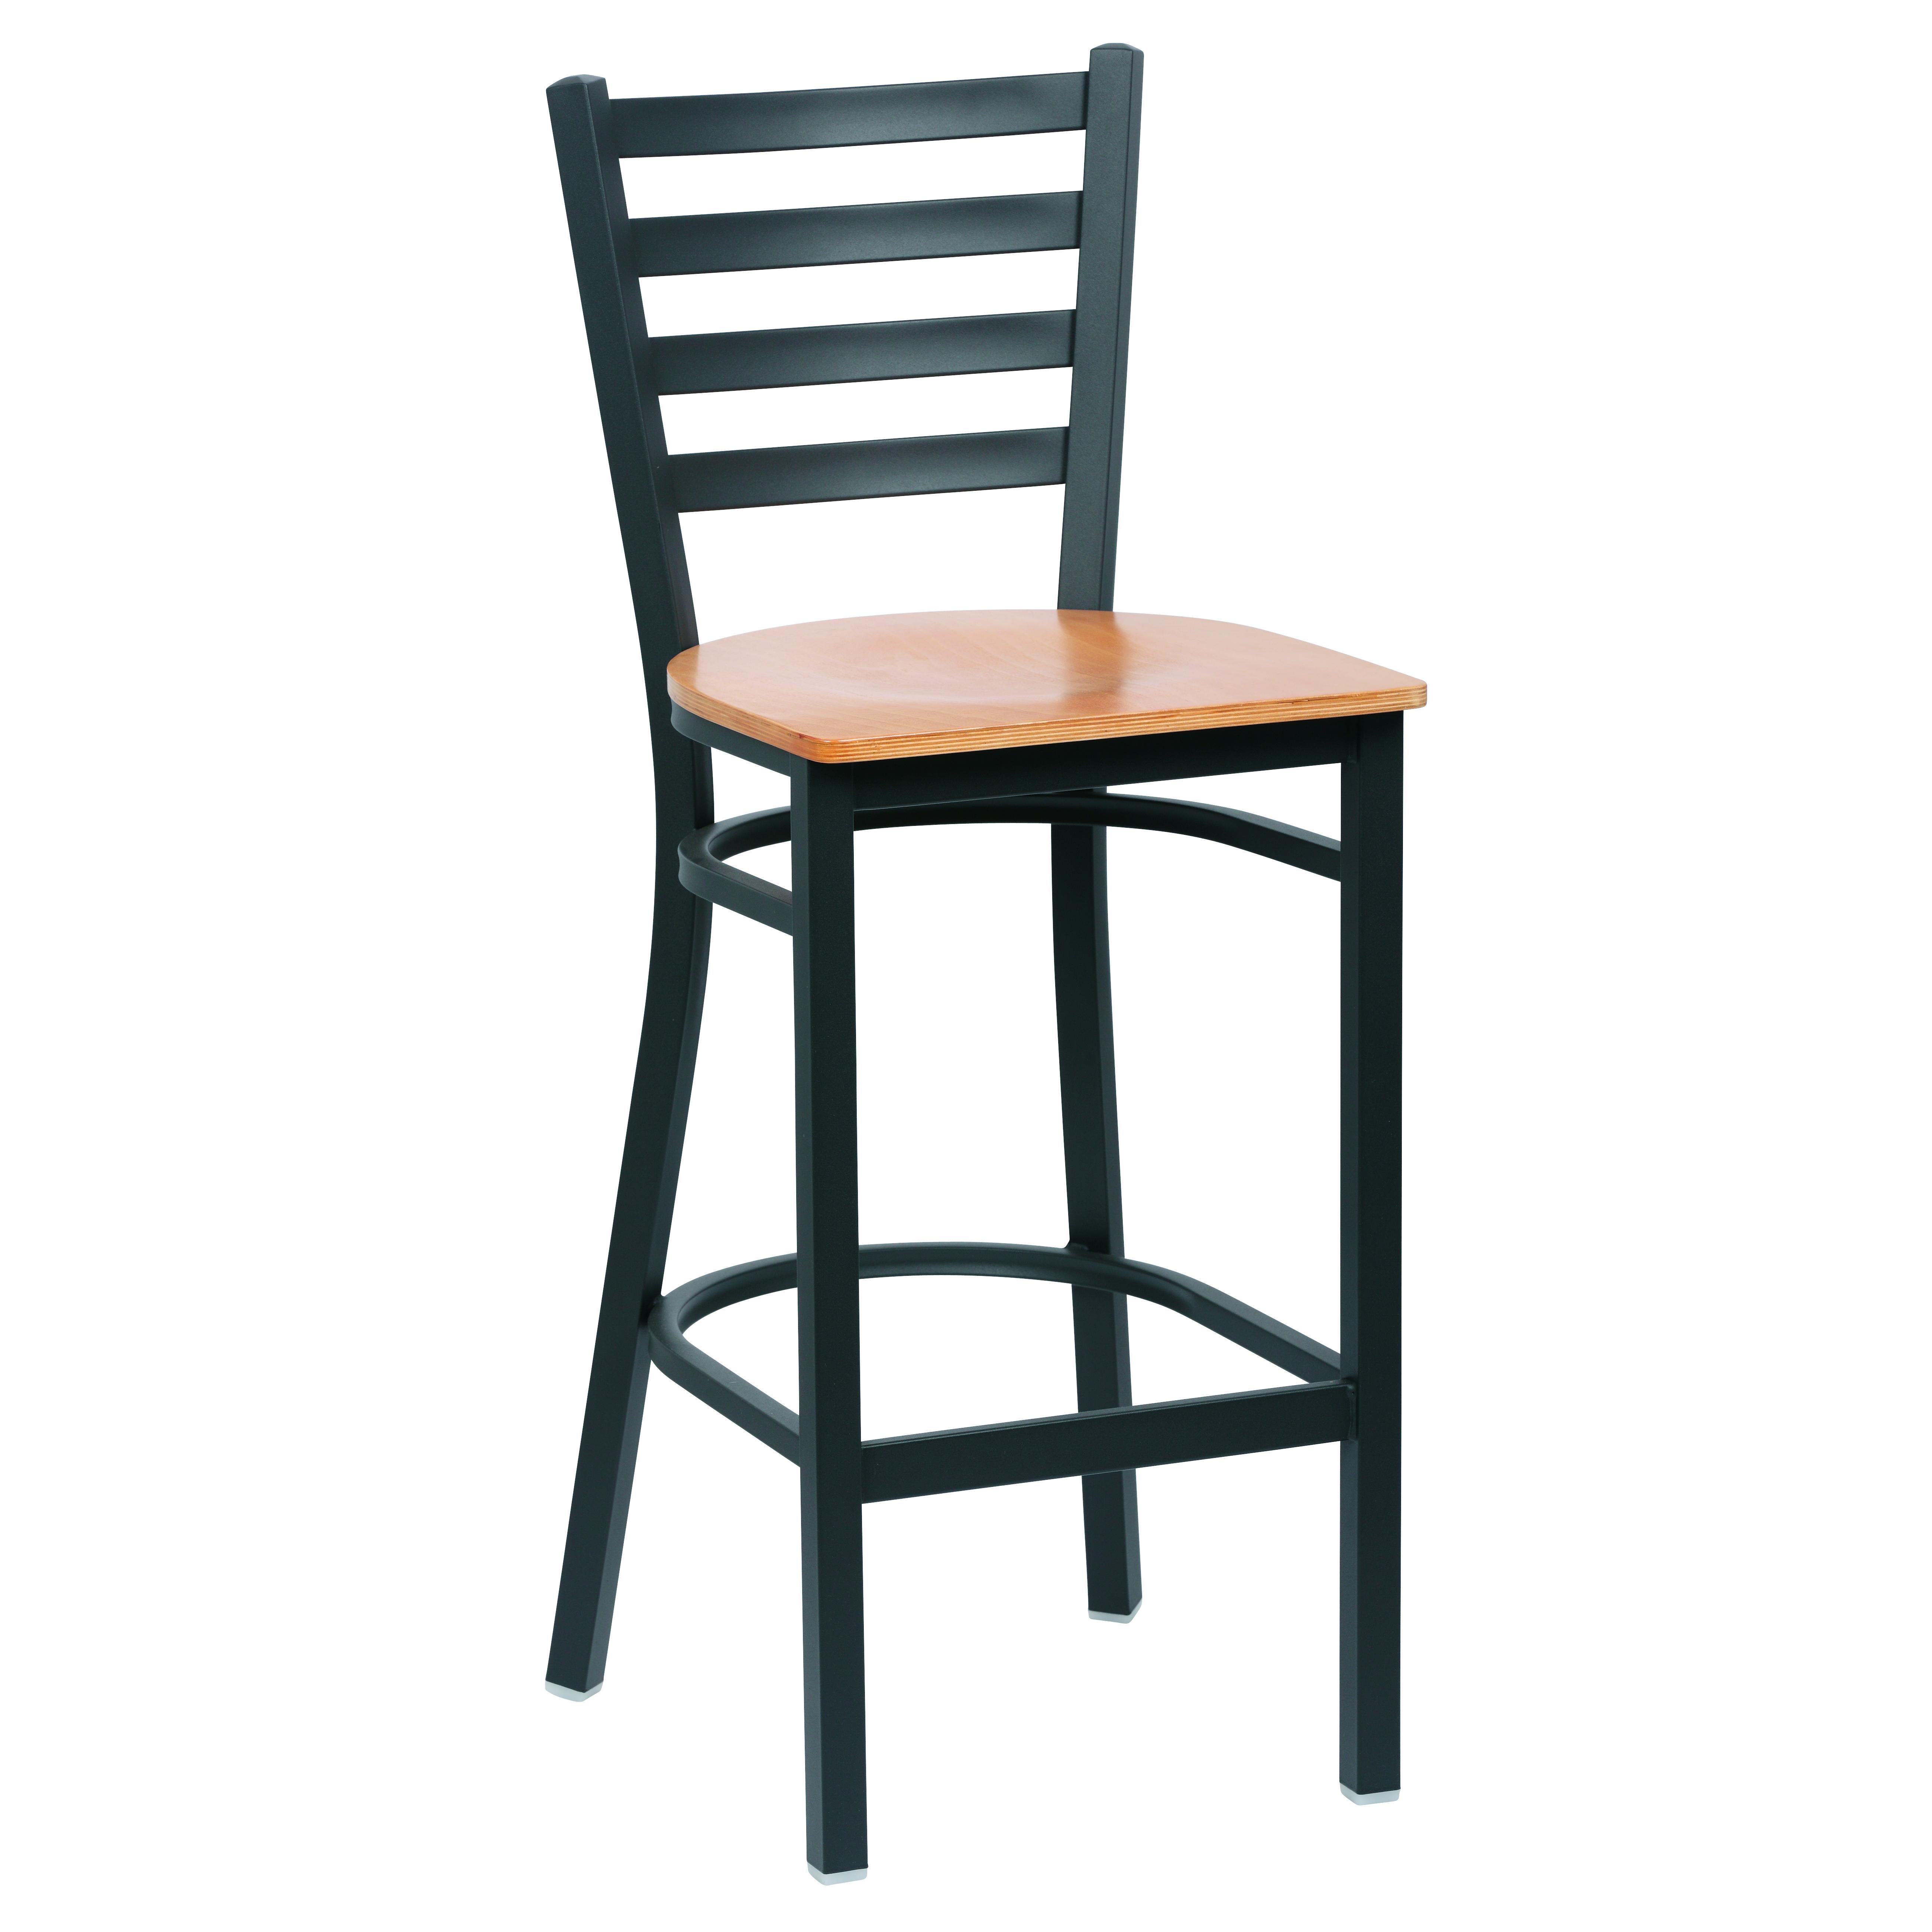 Royal Industries ROY 9002 N bar stool, indoor